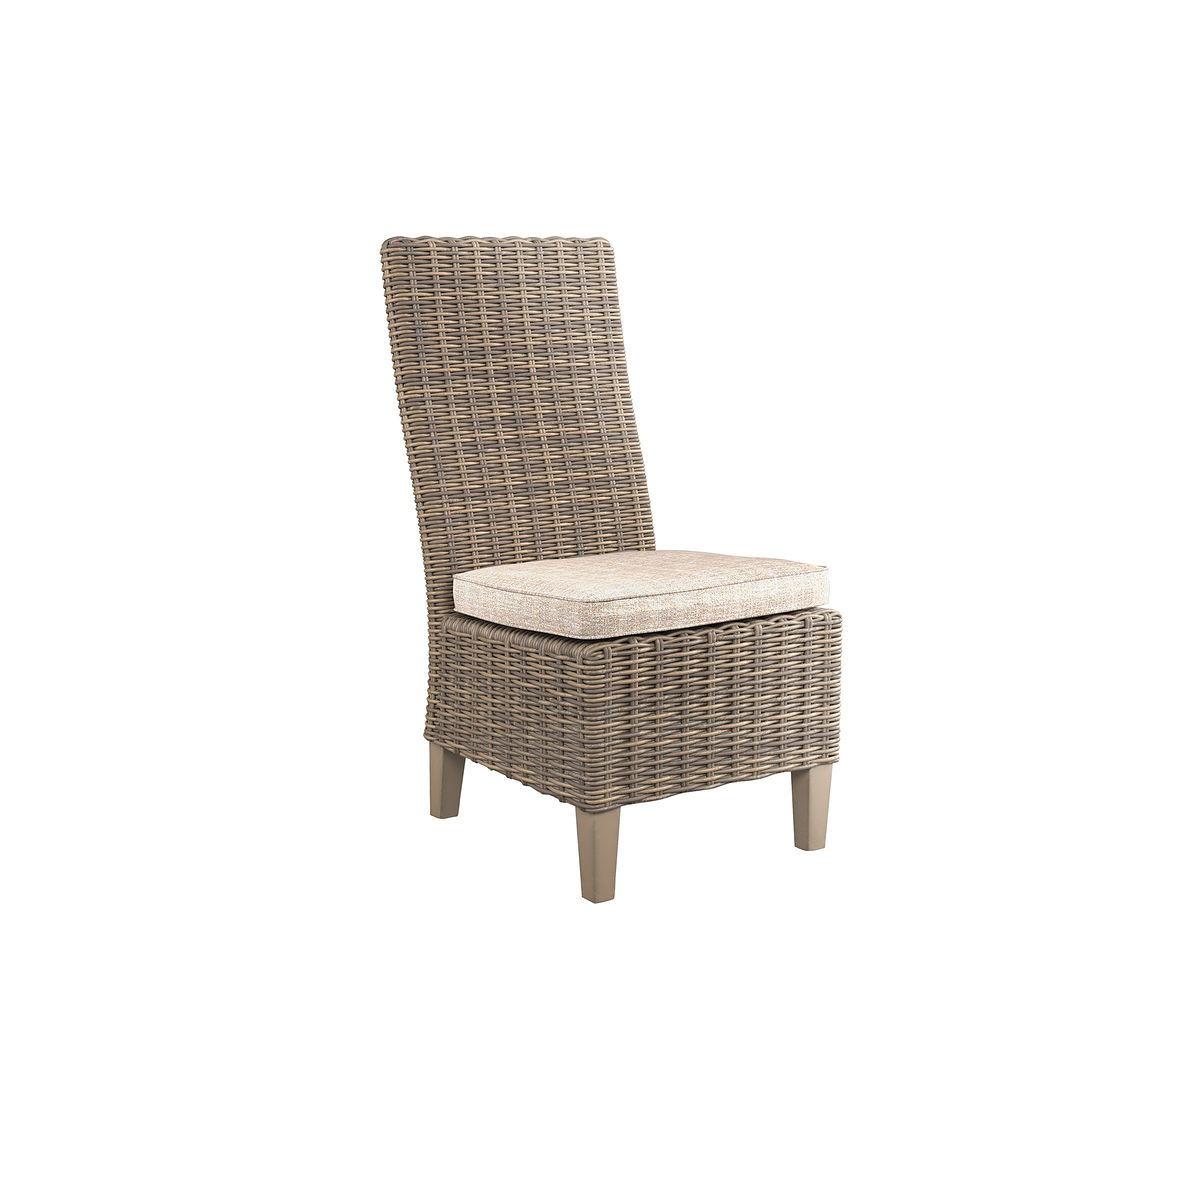 Beachcroft - Beige - Side Chair with Cushion (2/CN) - EZ ... on Beachcroft Beige Outdoor Living Room Set id=73194